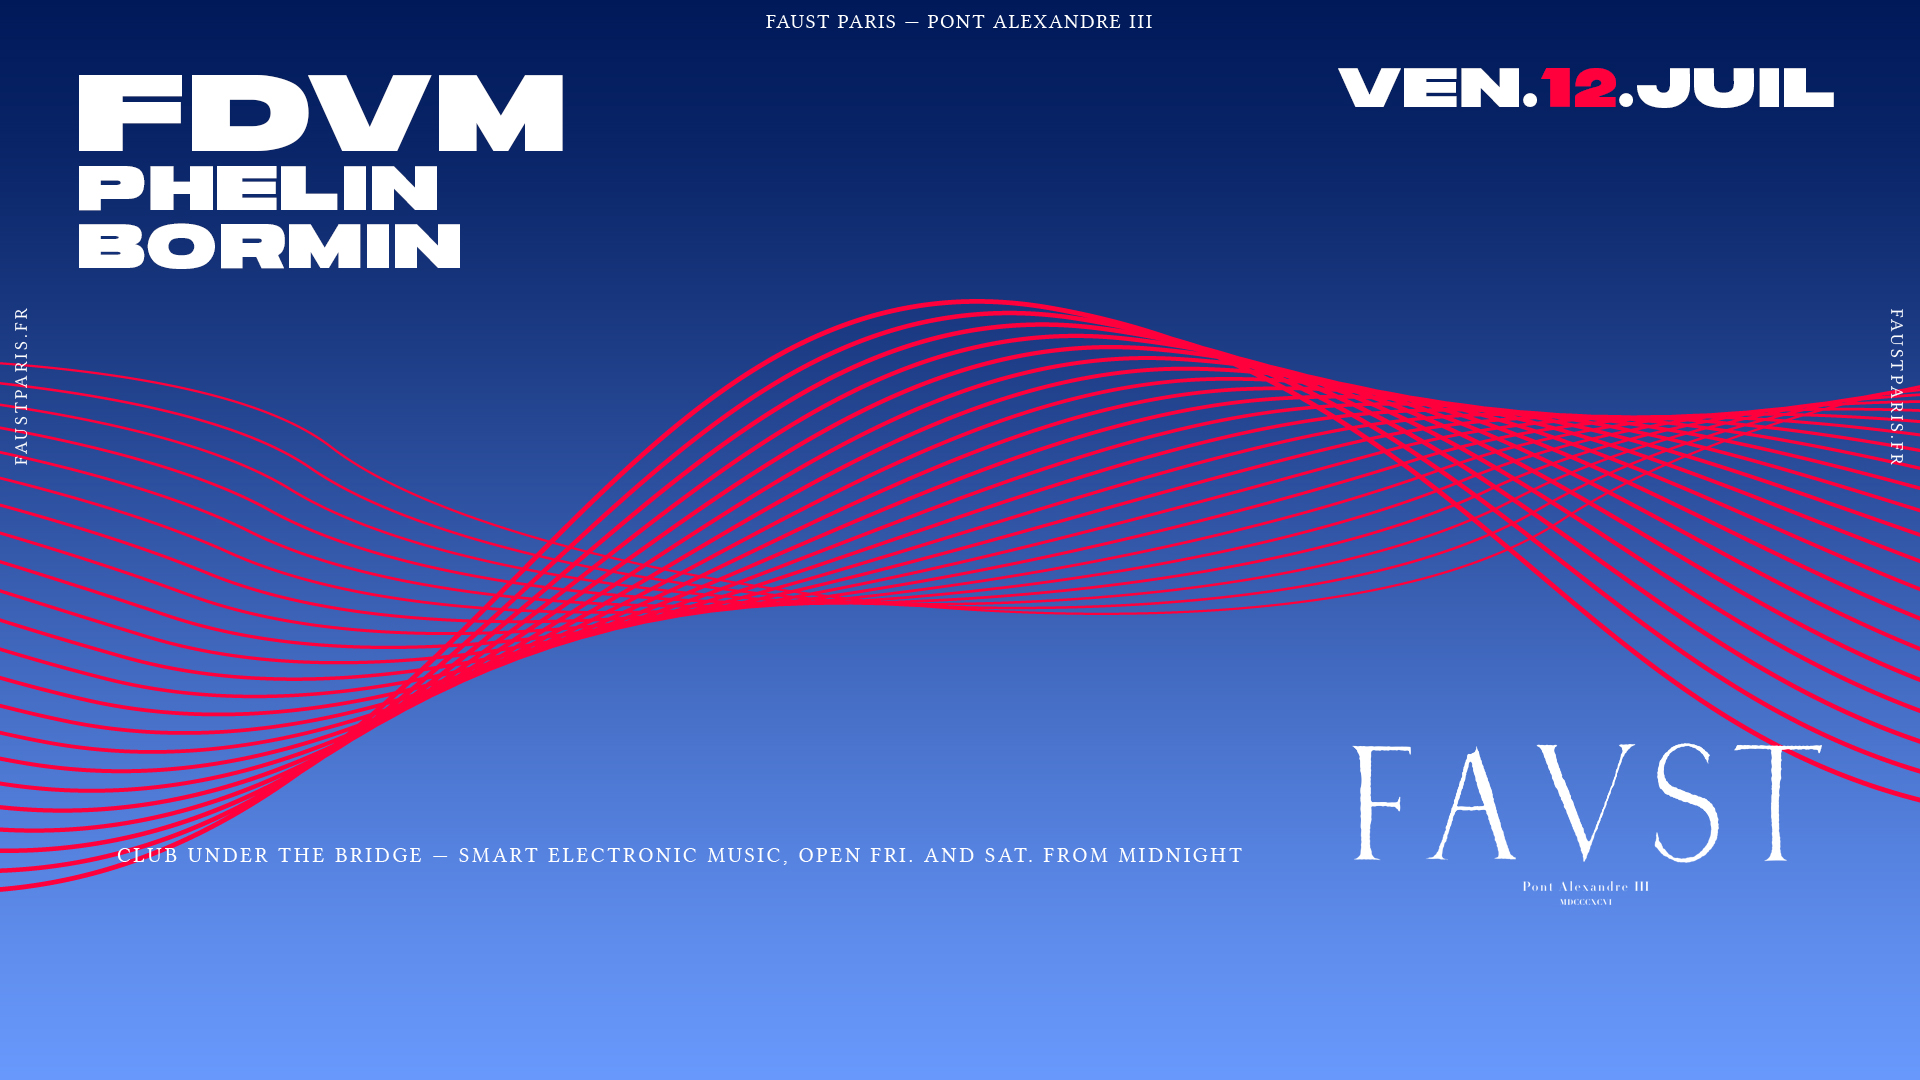 Faust - FDVM